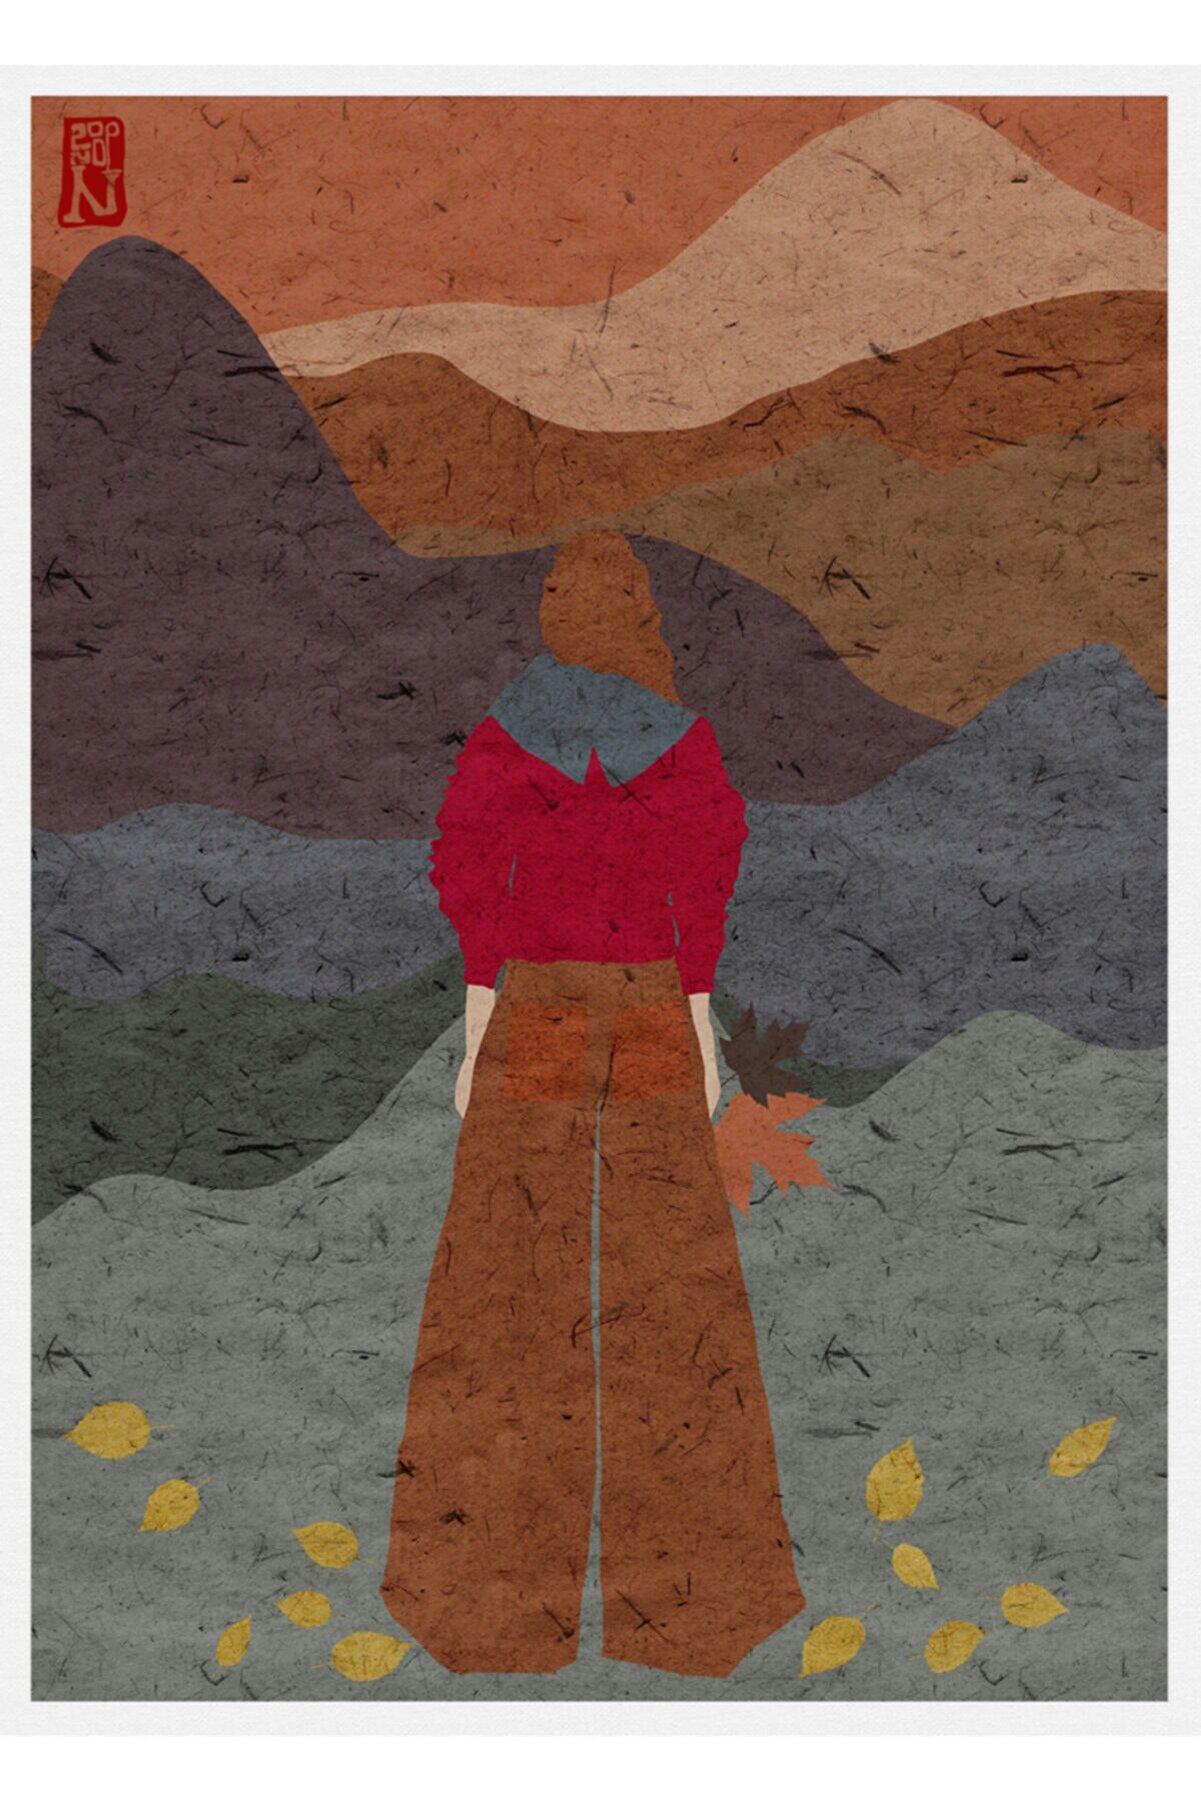 Nilol Print Walk Into Autumn, 29x42, Dijital Illüstrasyon, Fine Art Baskı